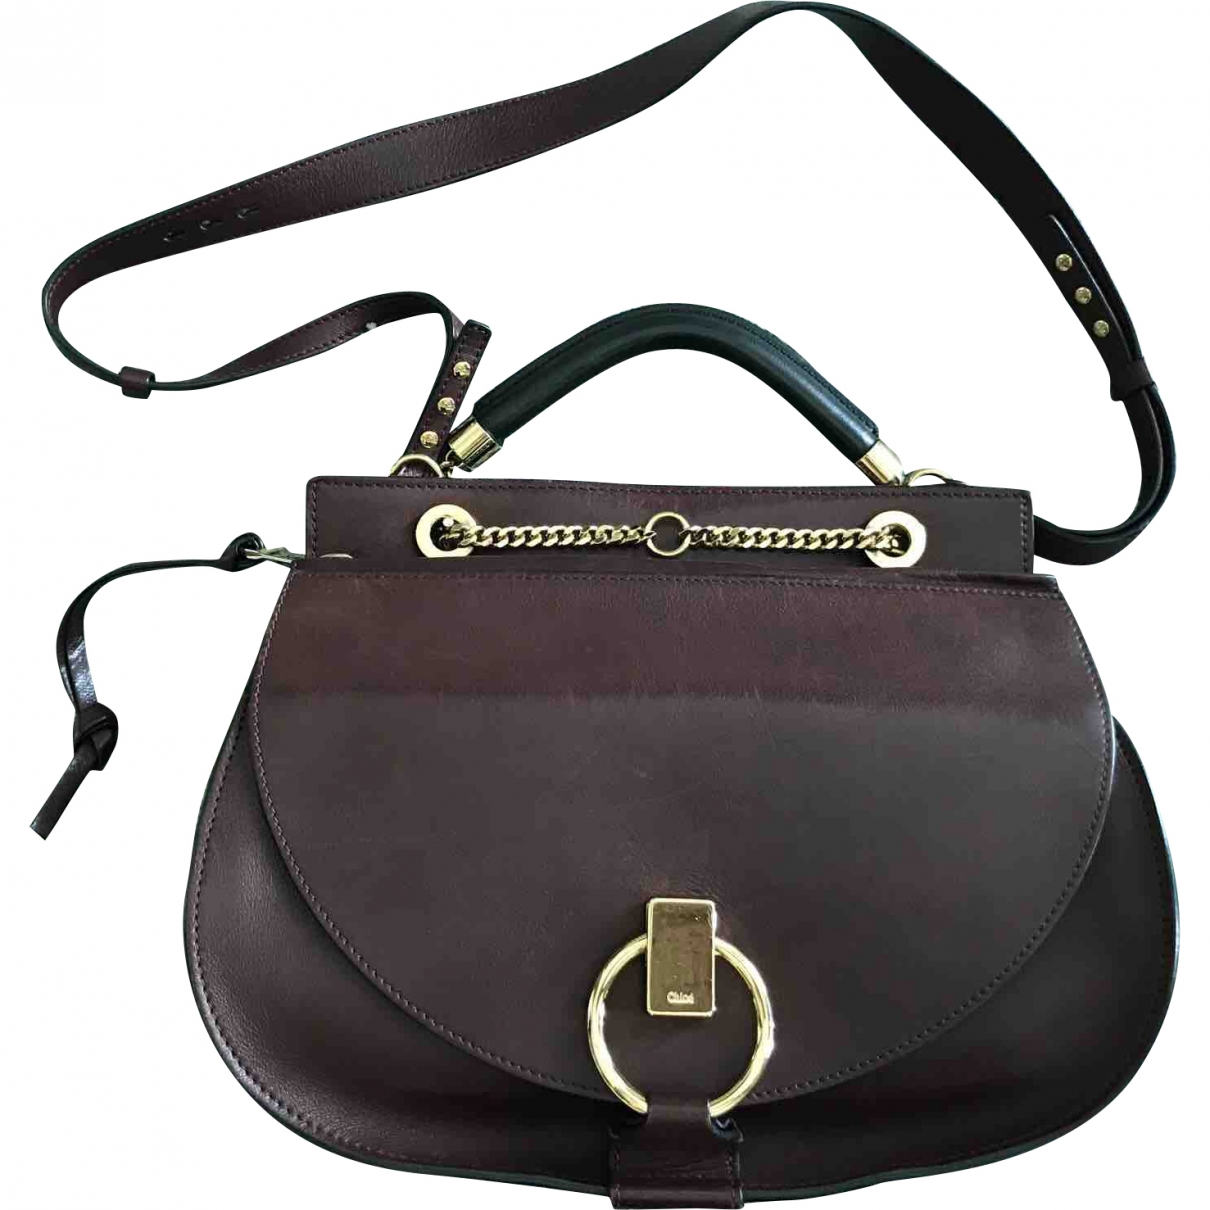 Chloé \N Burgundy Leather handbag for Women \N